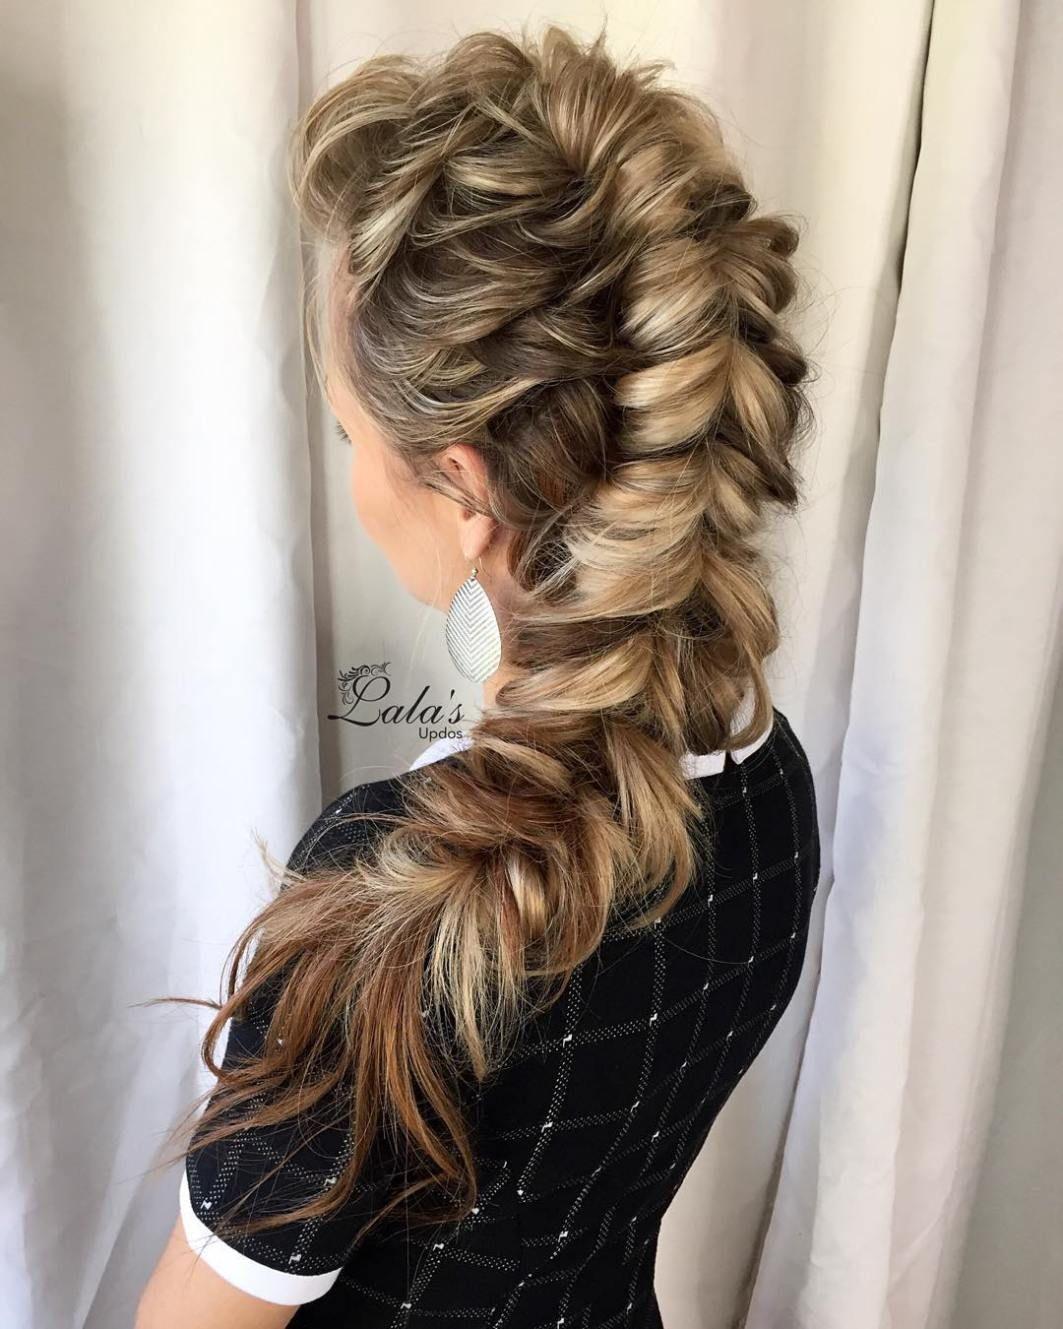 Mohawk Fishtail Braid BraidedHairstyles Beautiful in